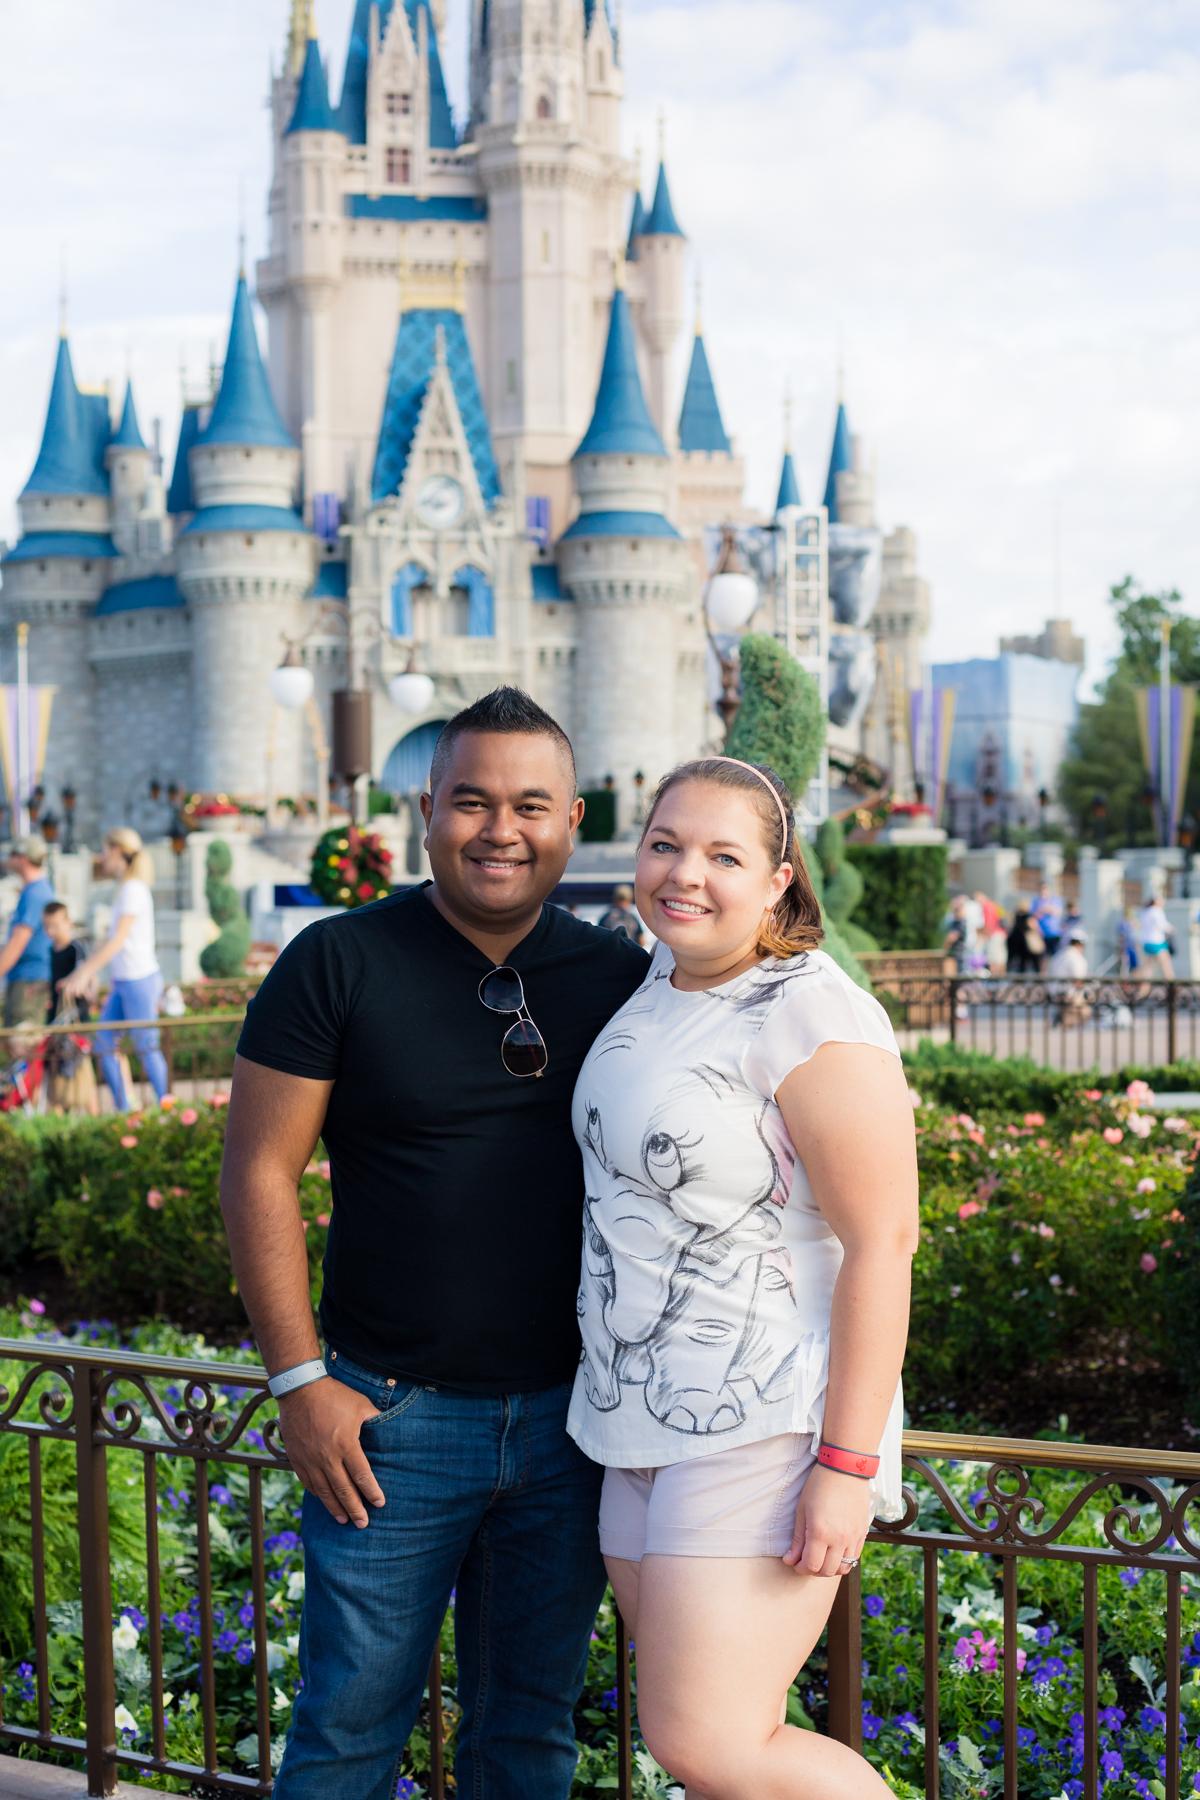 Announcing a Pregnancy at Walt Disney World